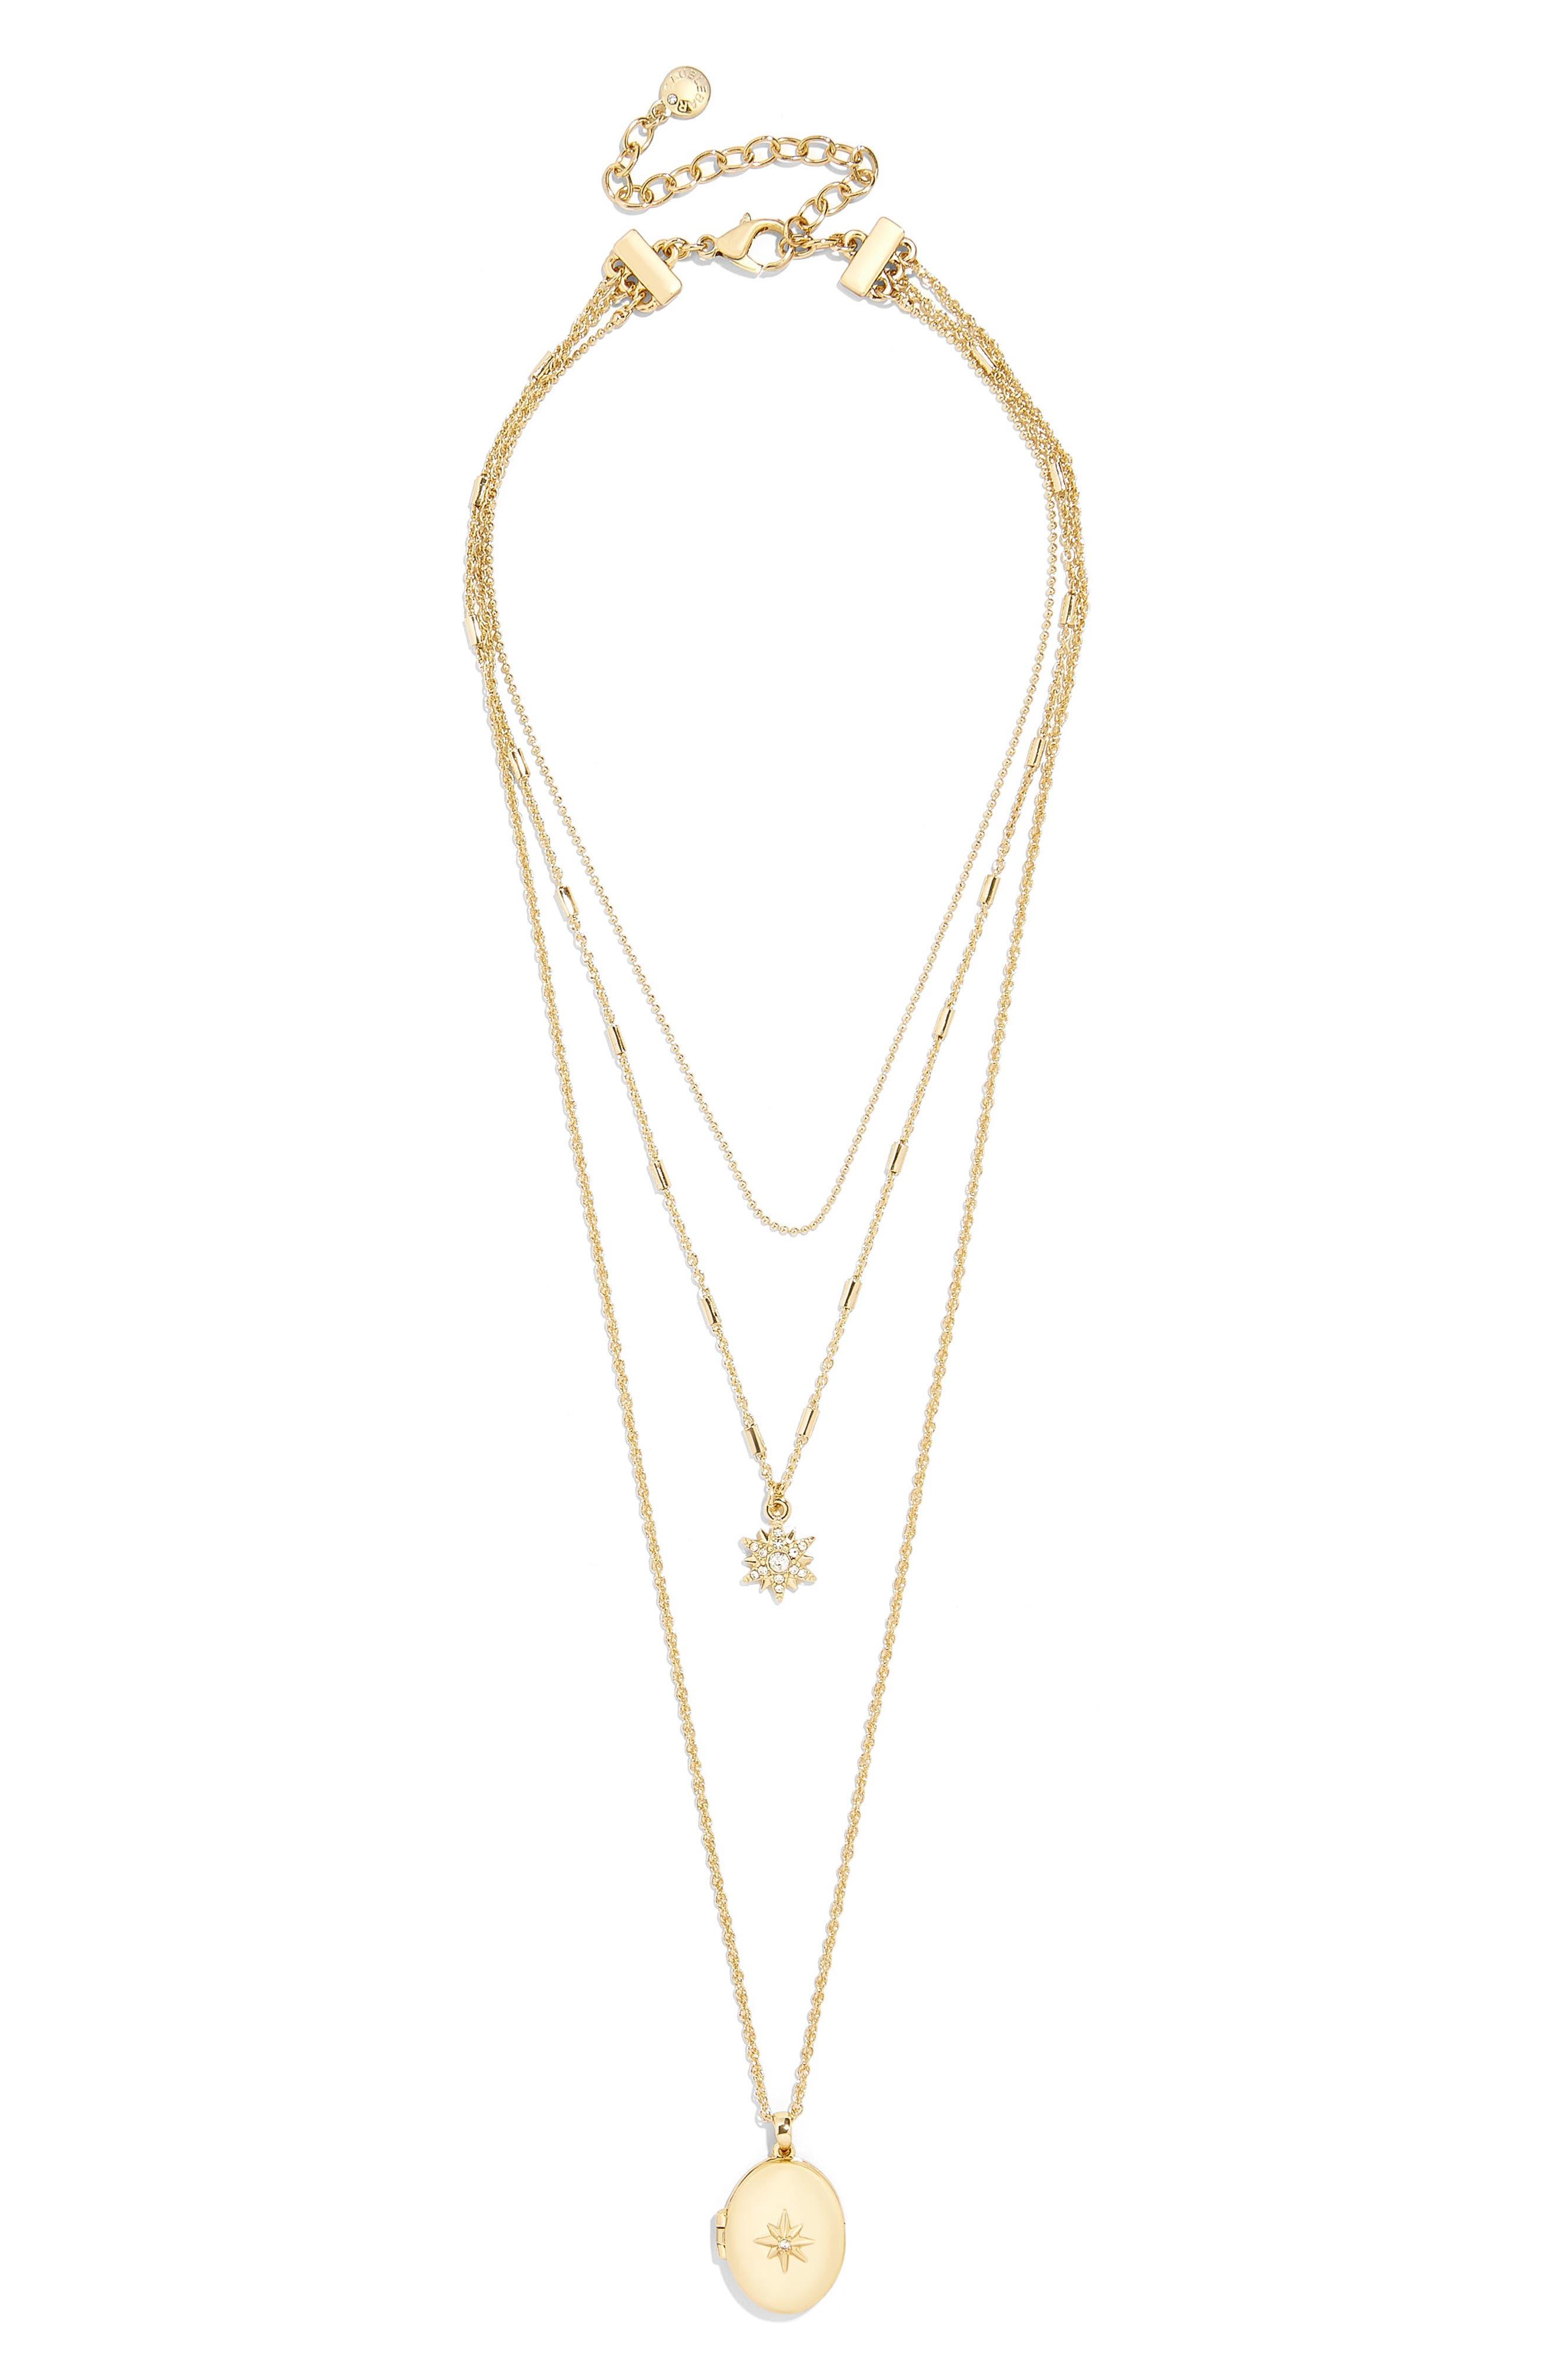 BAUBLEBAR Melisandra Layered Pendant Necklace, Main, color, GOLD